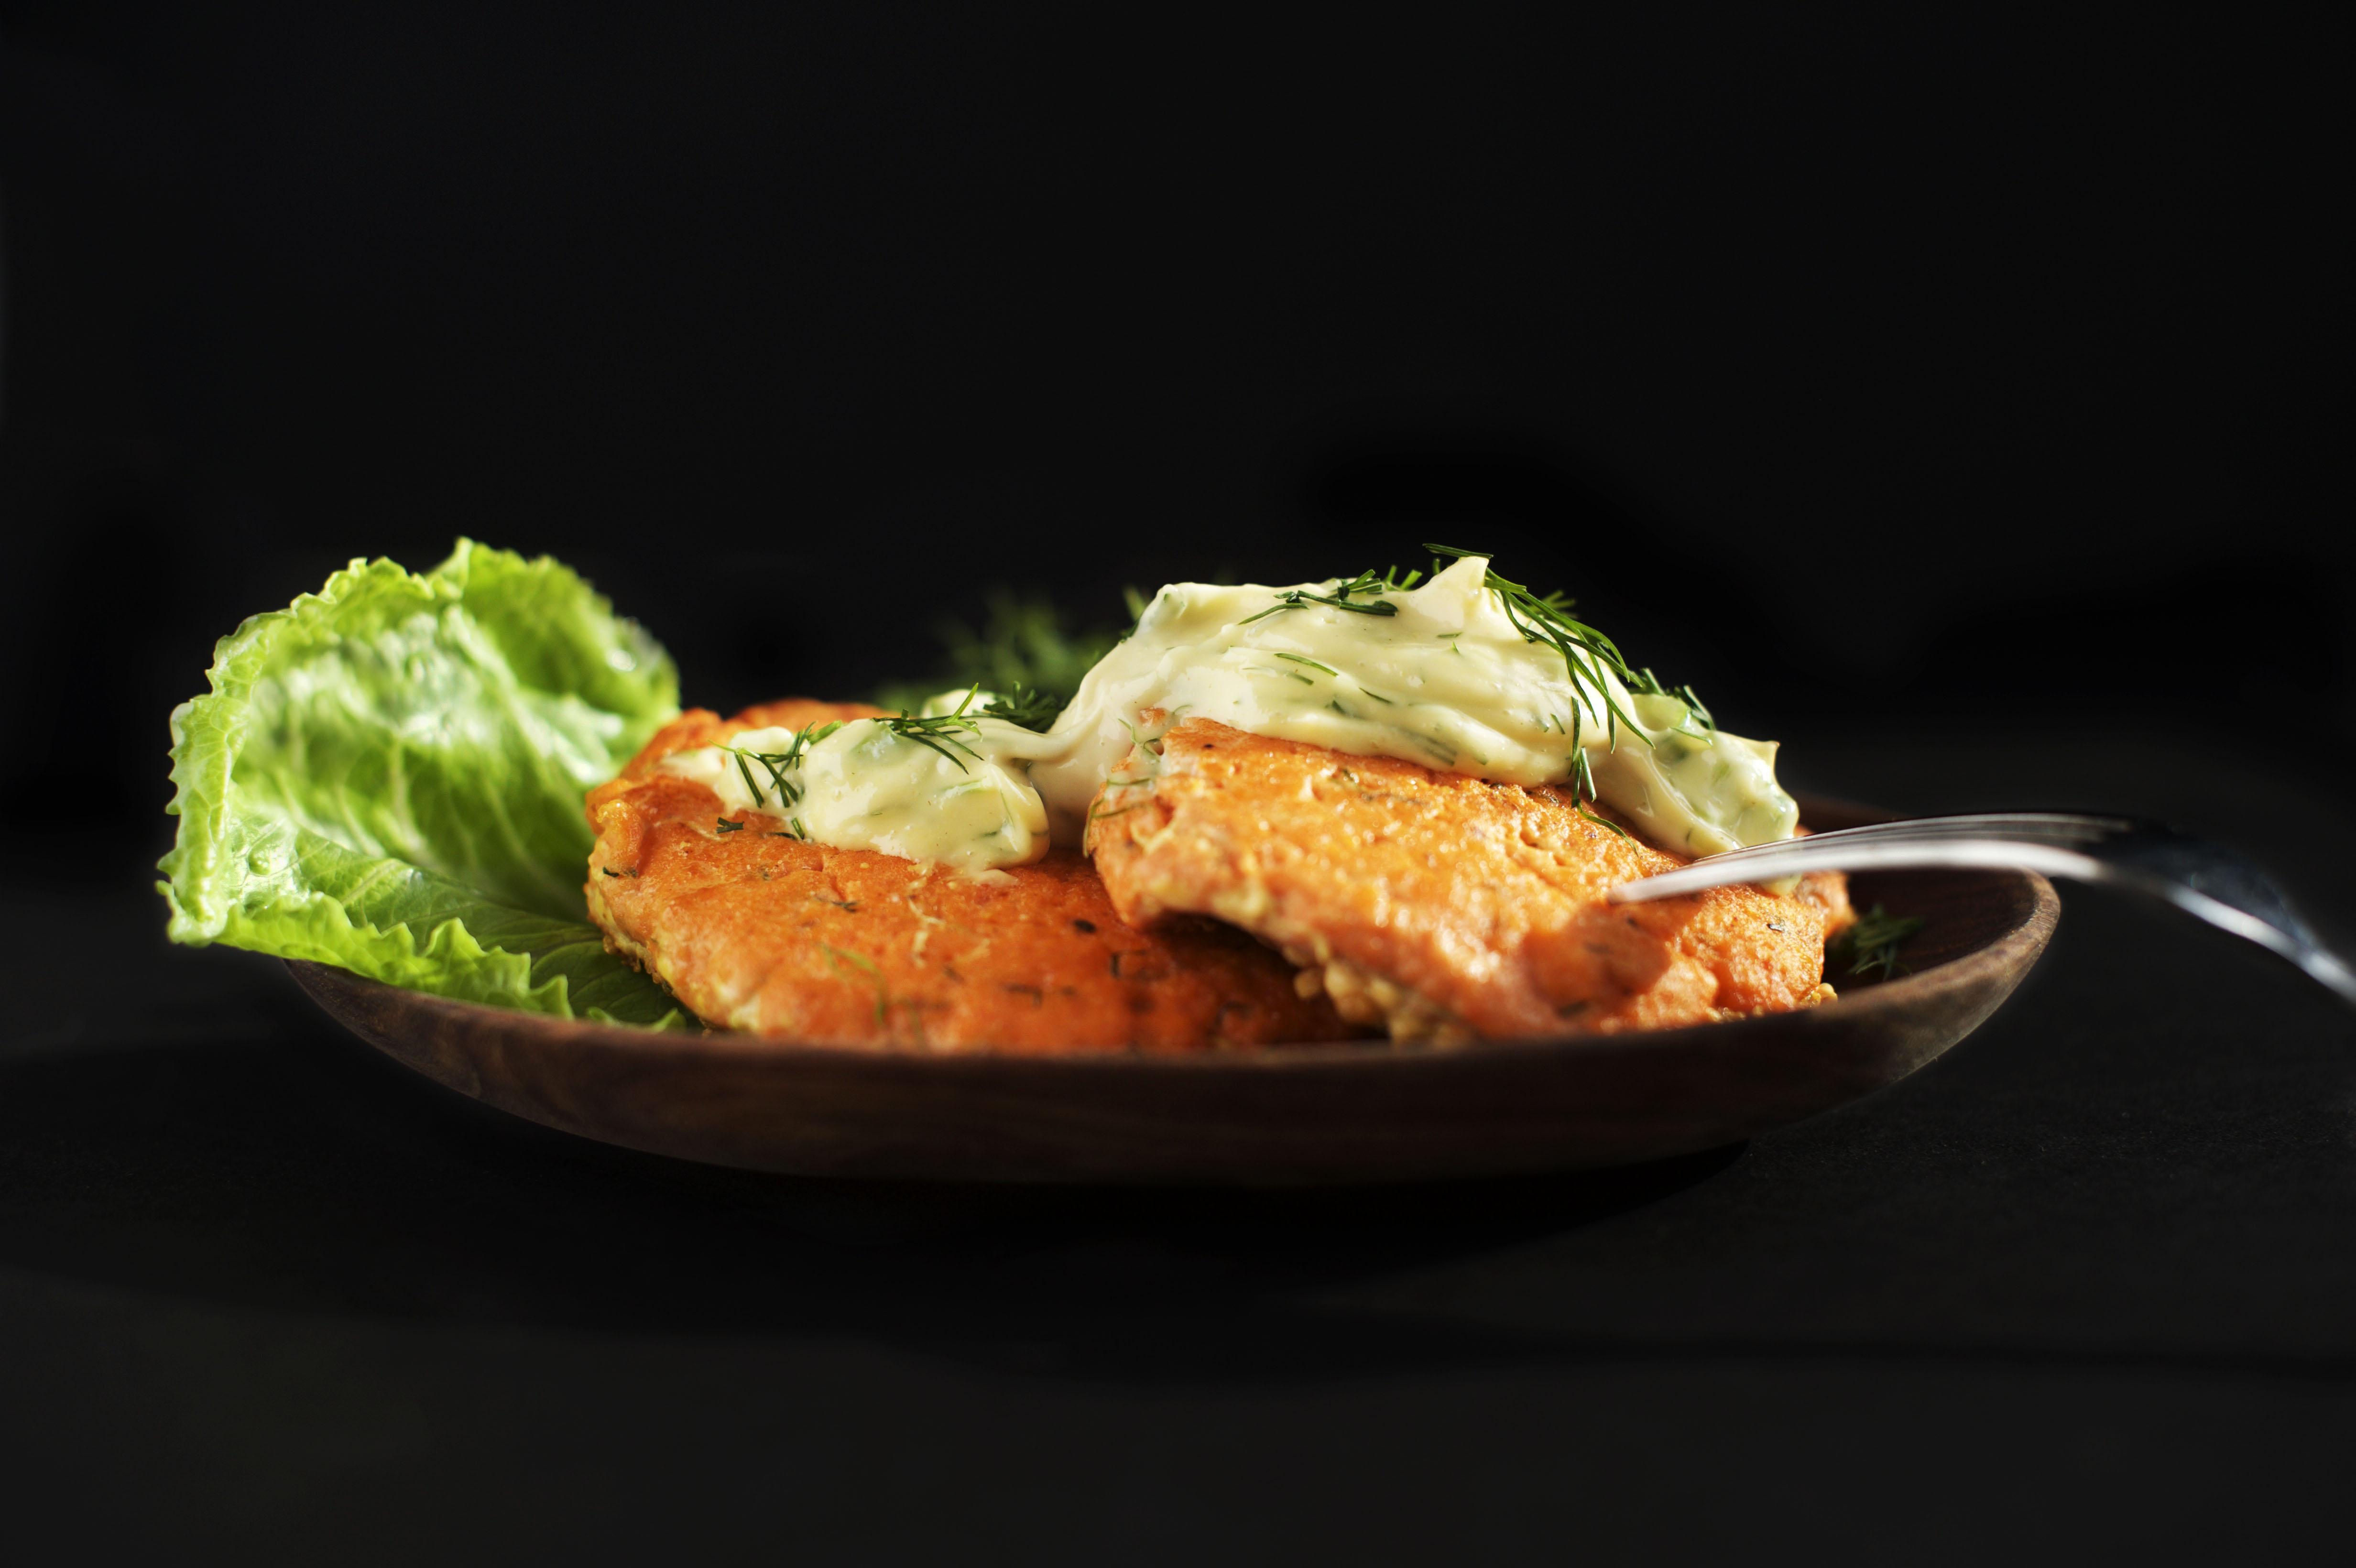 Salmon burgers with mustard dill sauce